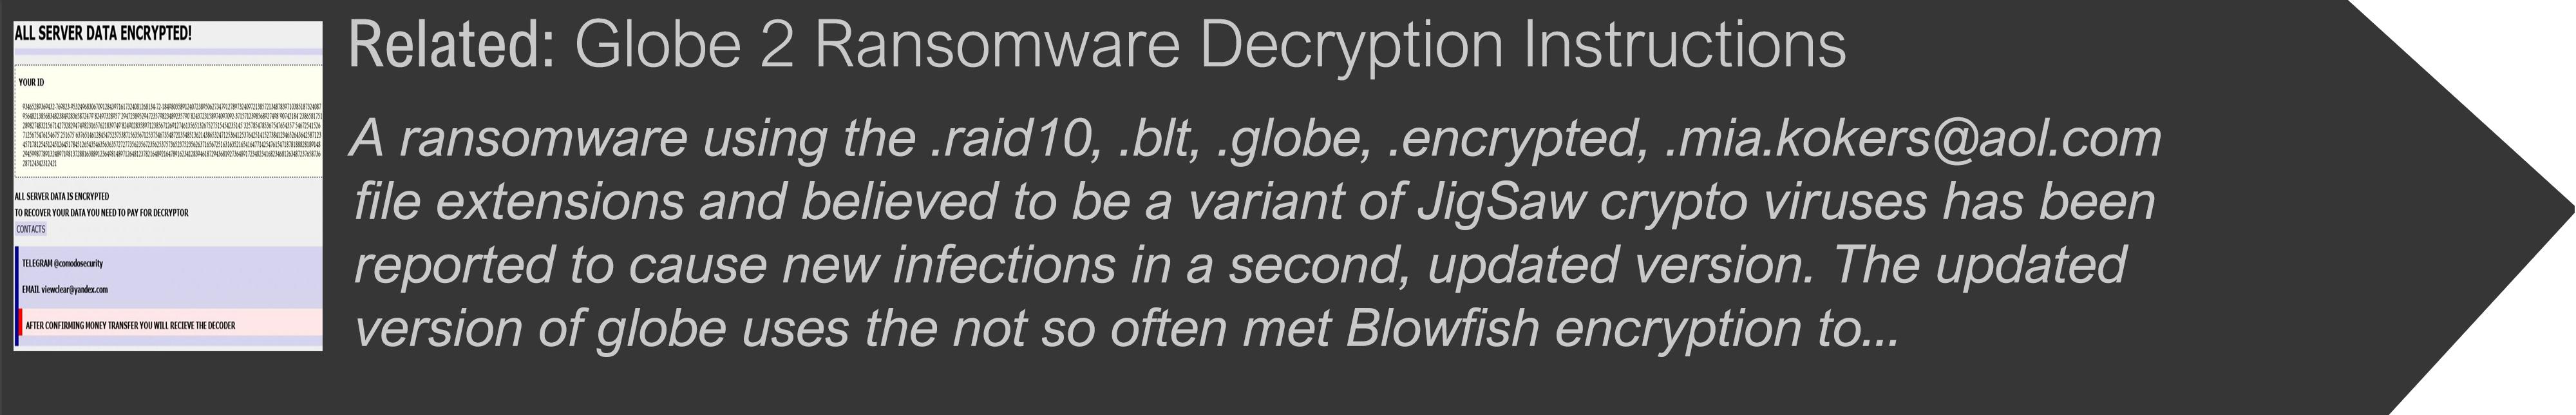 globe-2-0-ranomware-decryption-instructions-sensorstechforum